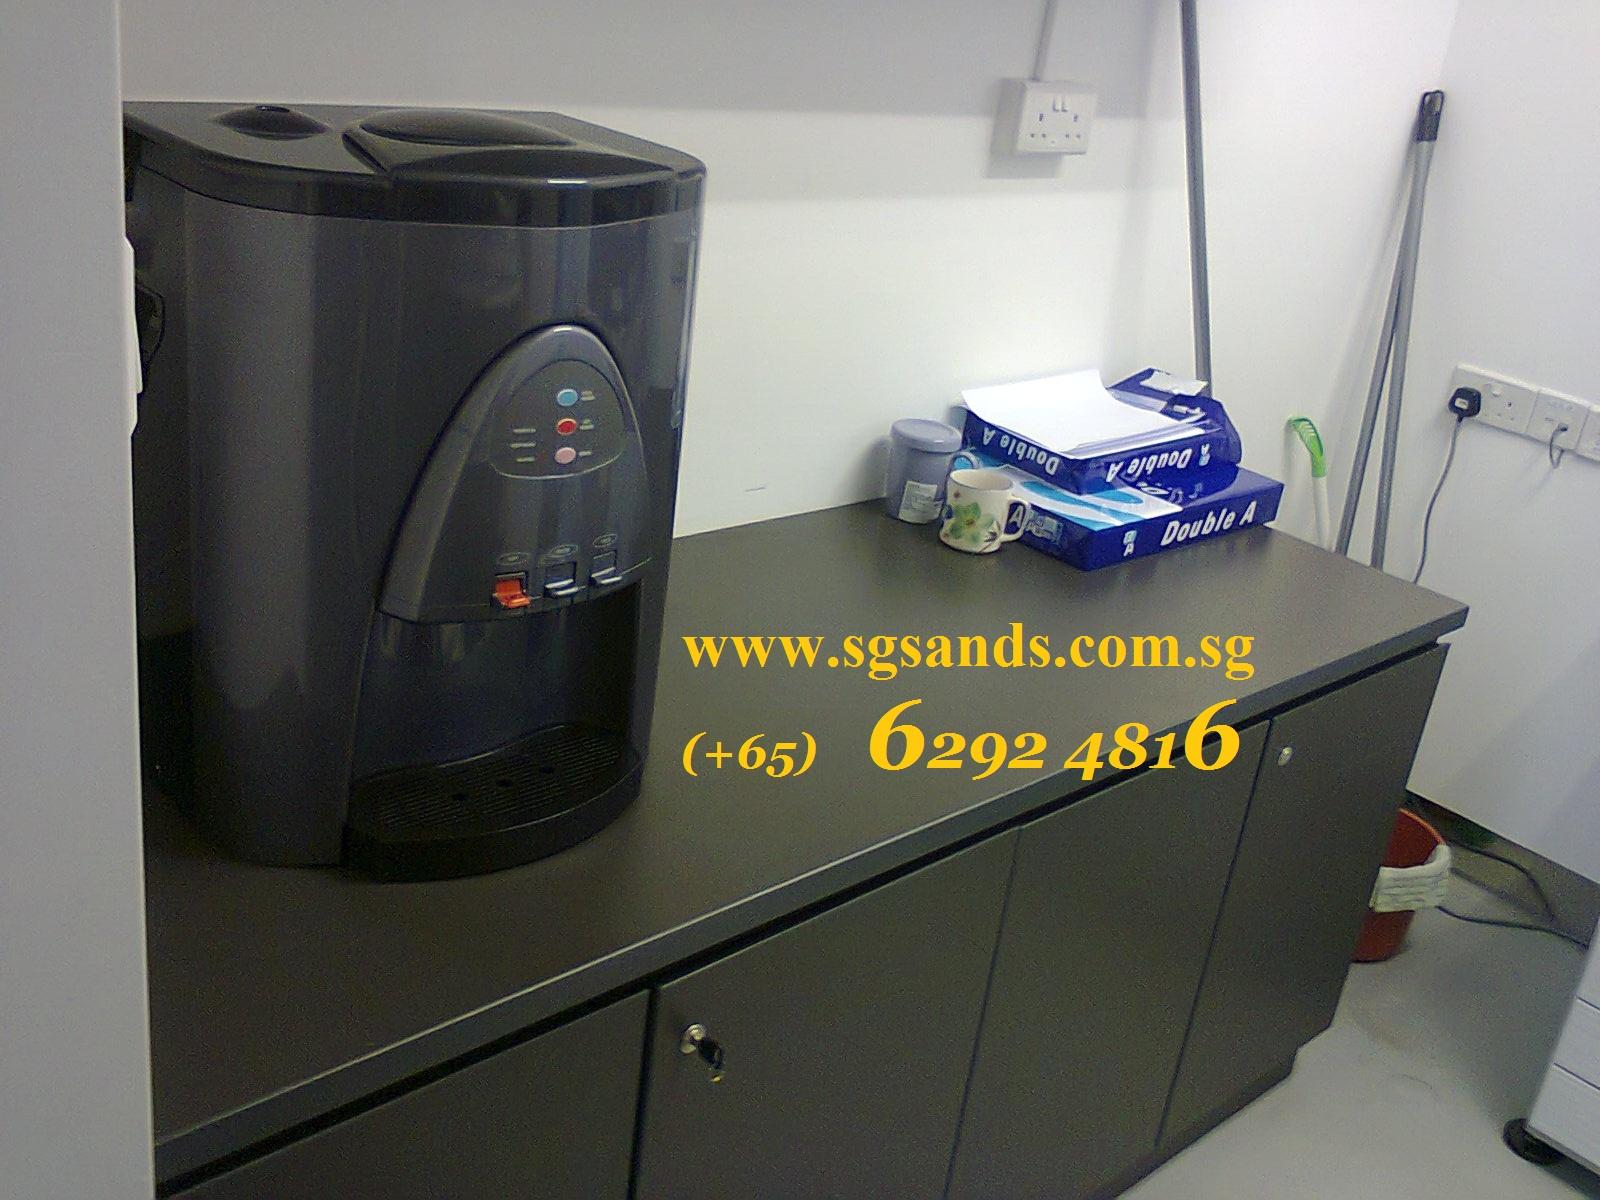 Singapore Water Dispenser Gallery SGsands CA919 Series